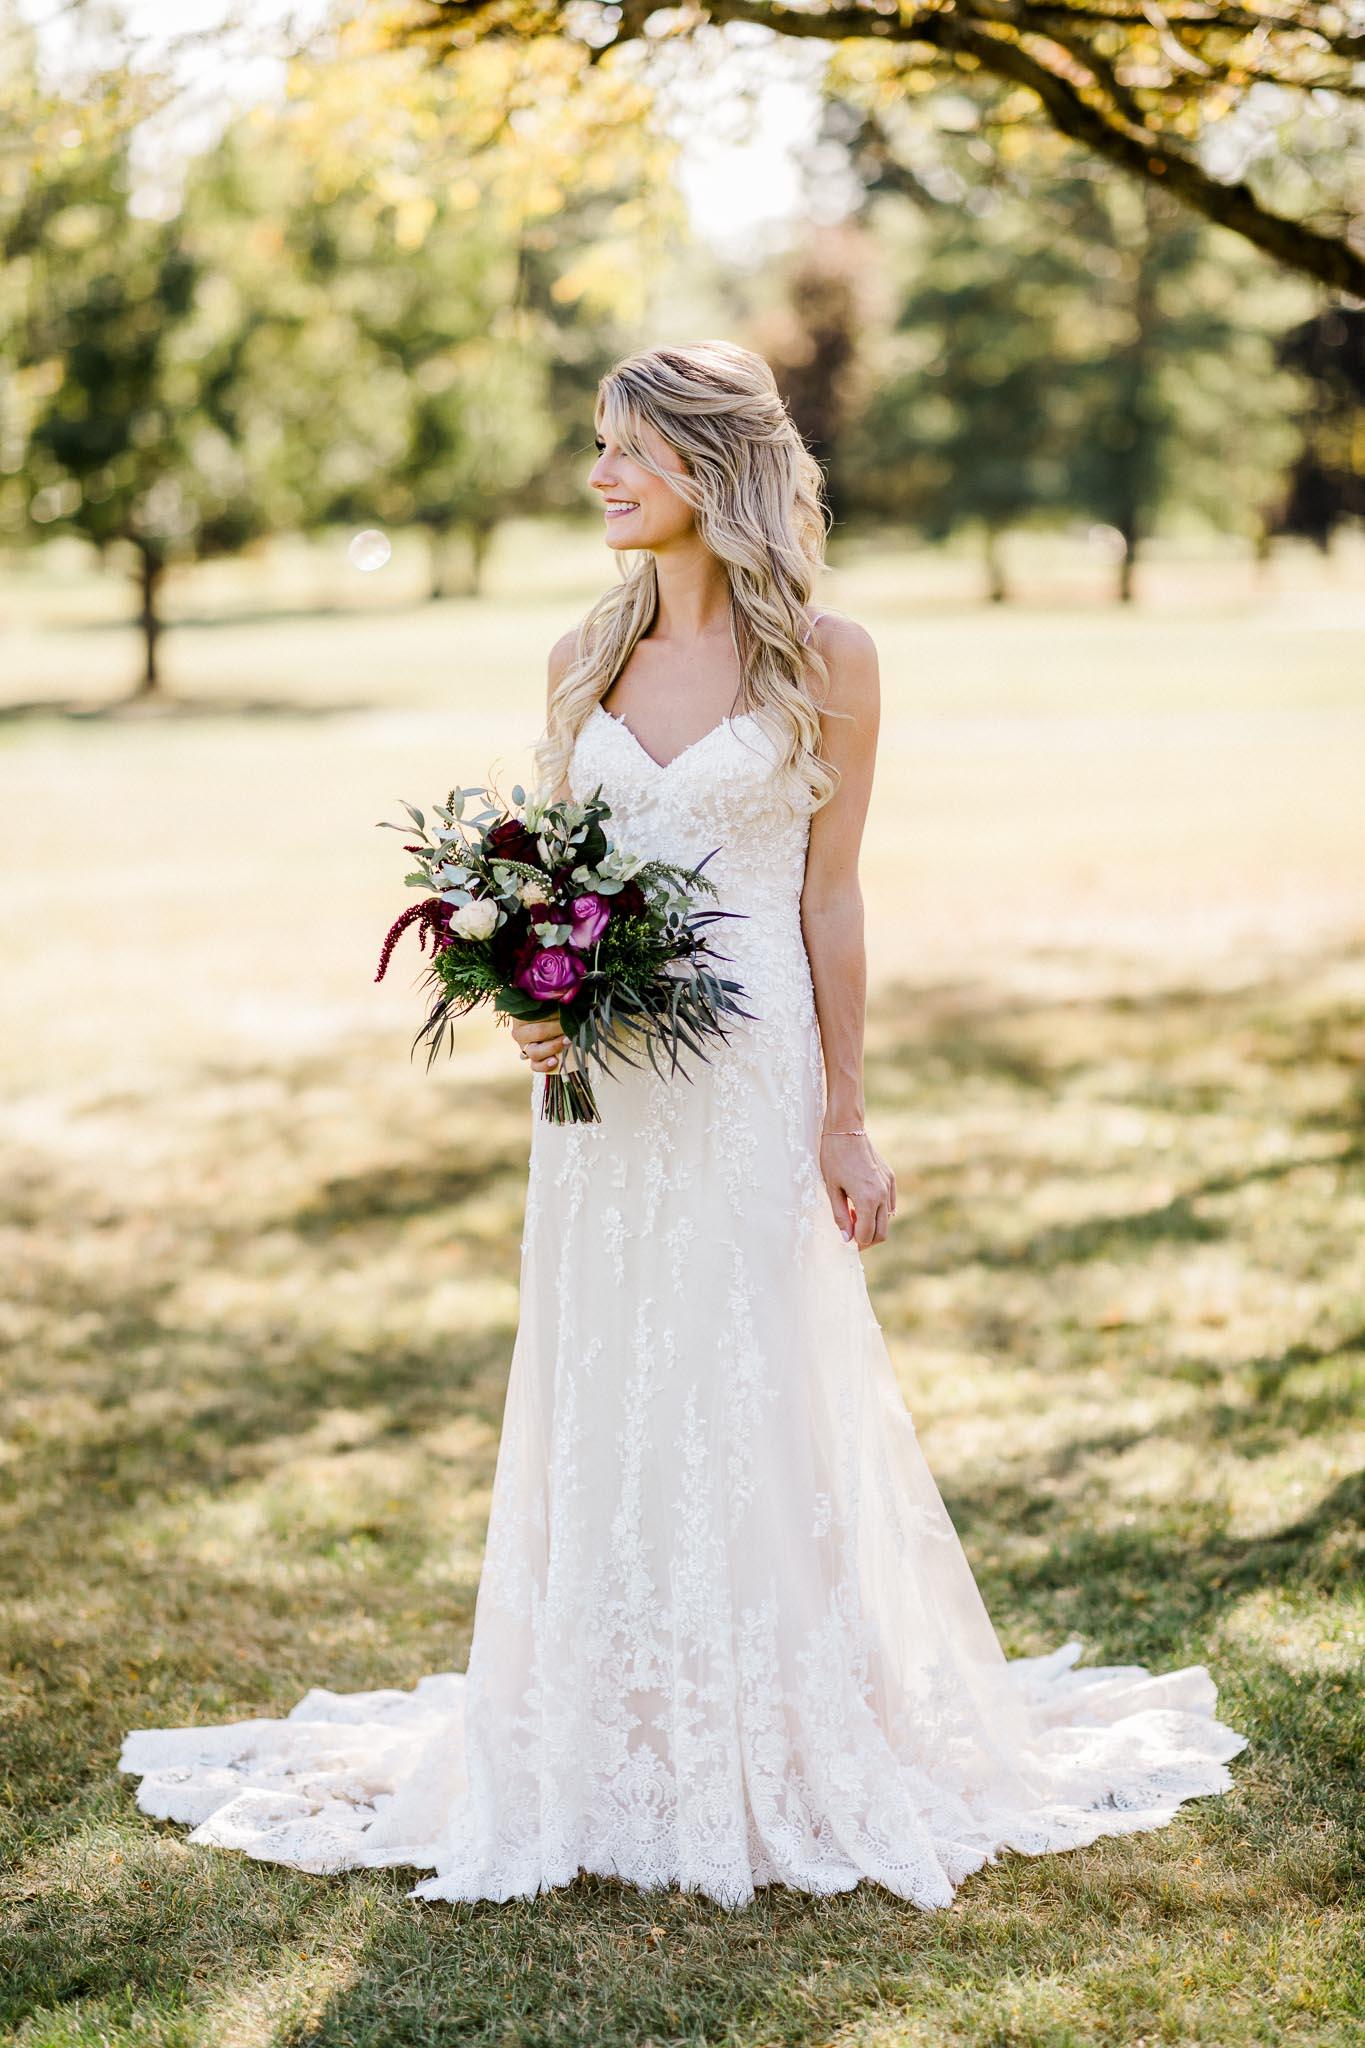 Frosty-Valley-September-Wedding-7562.jpg